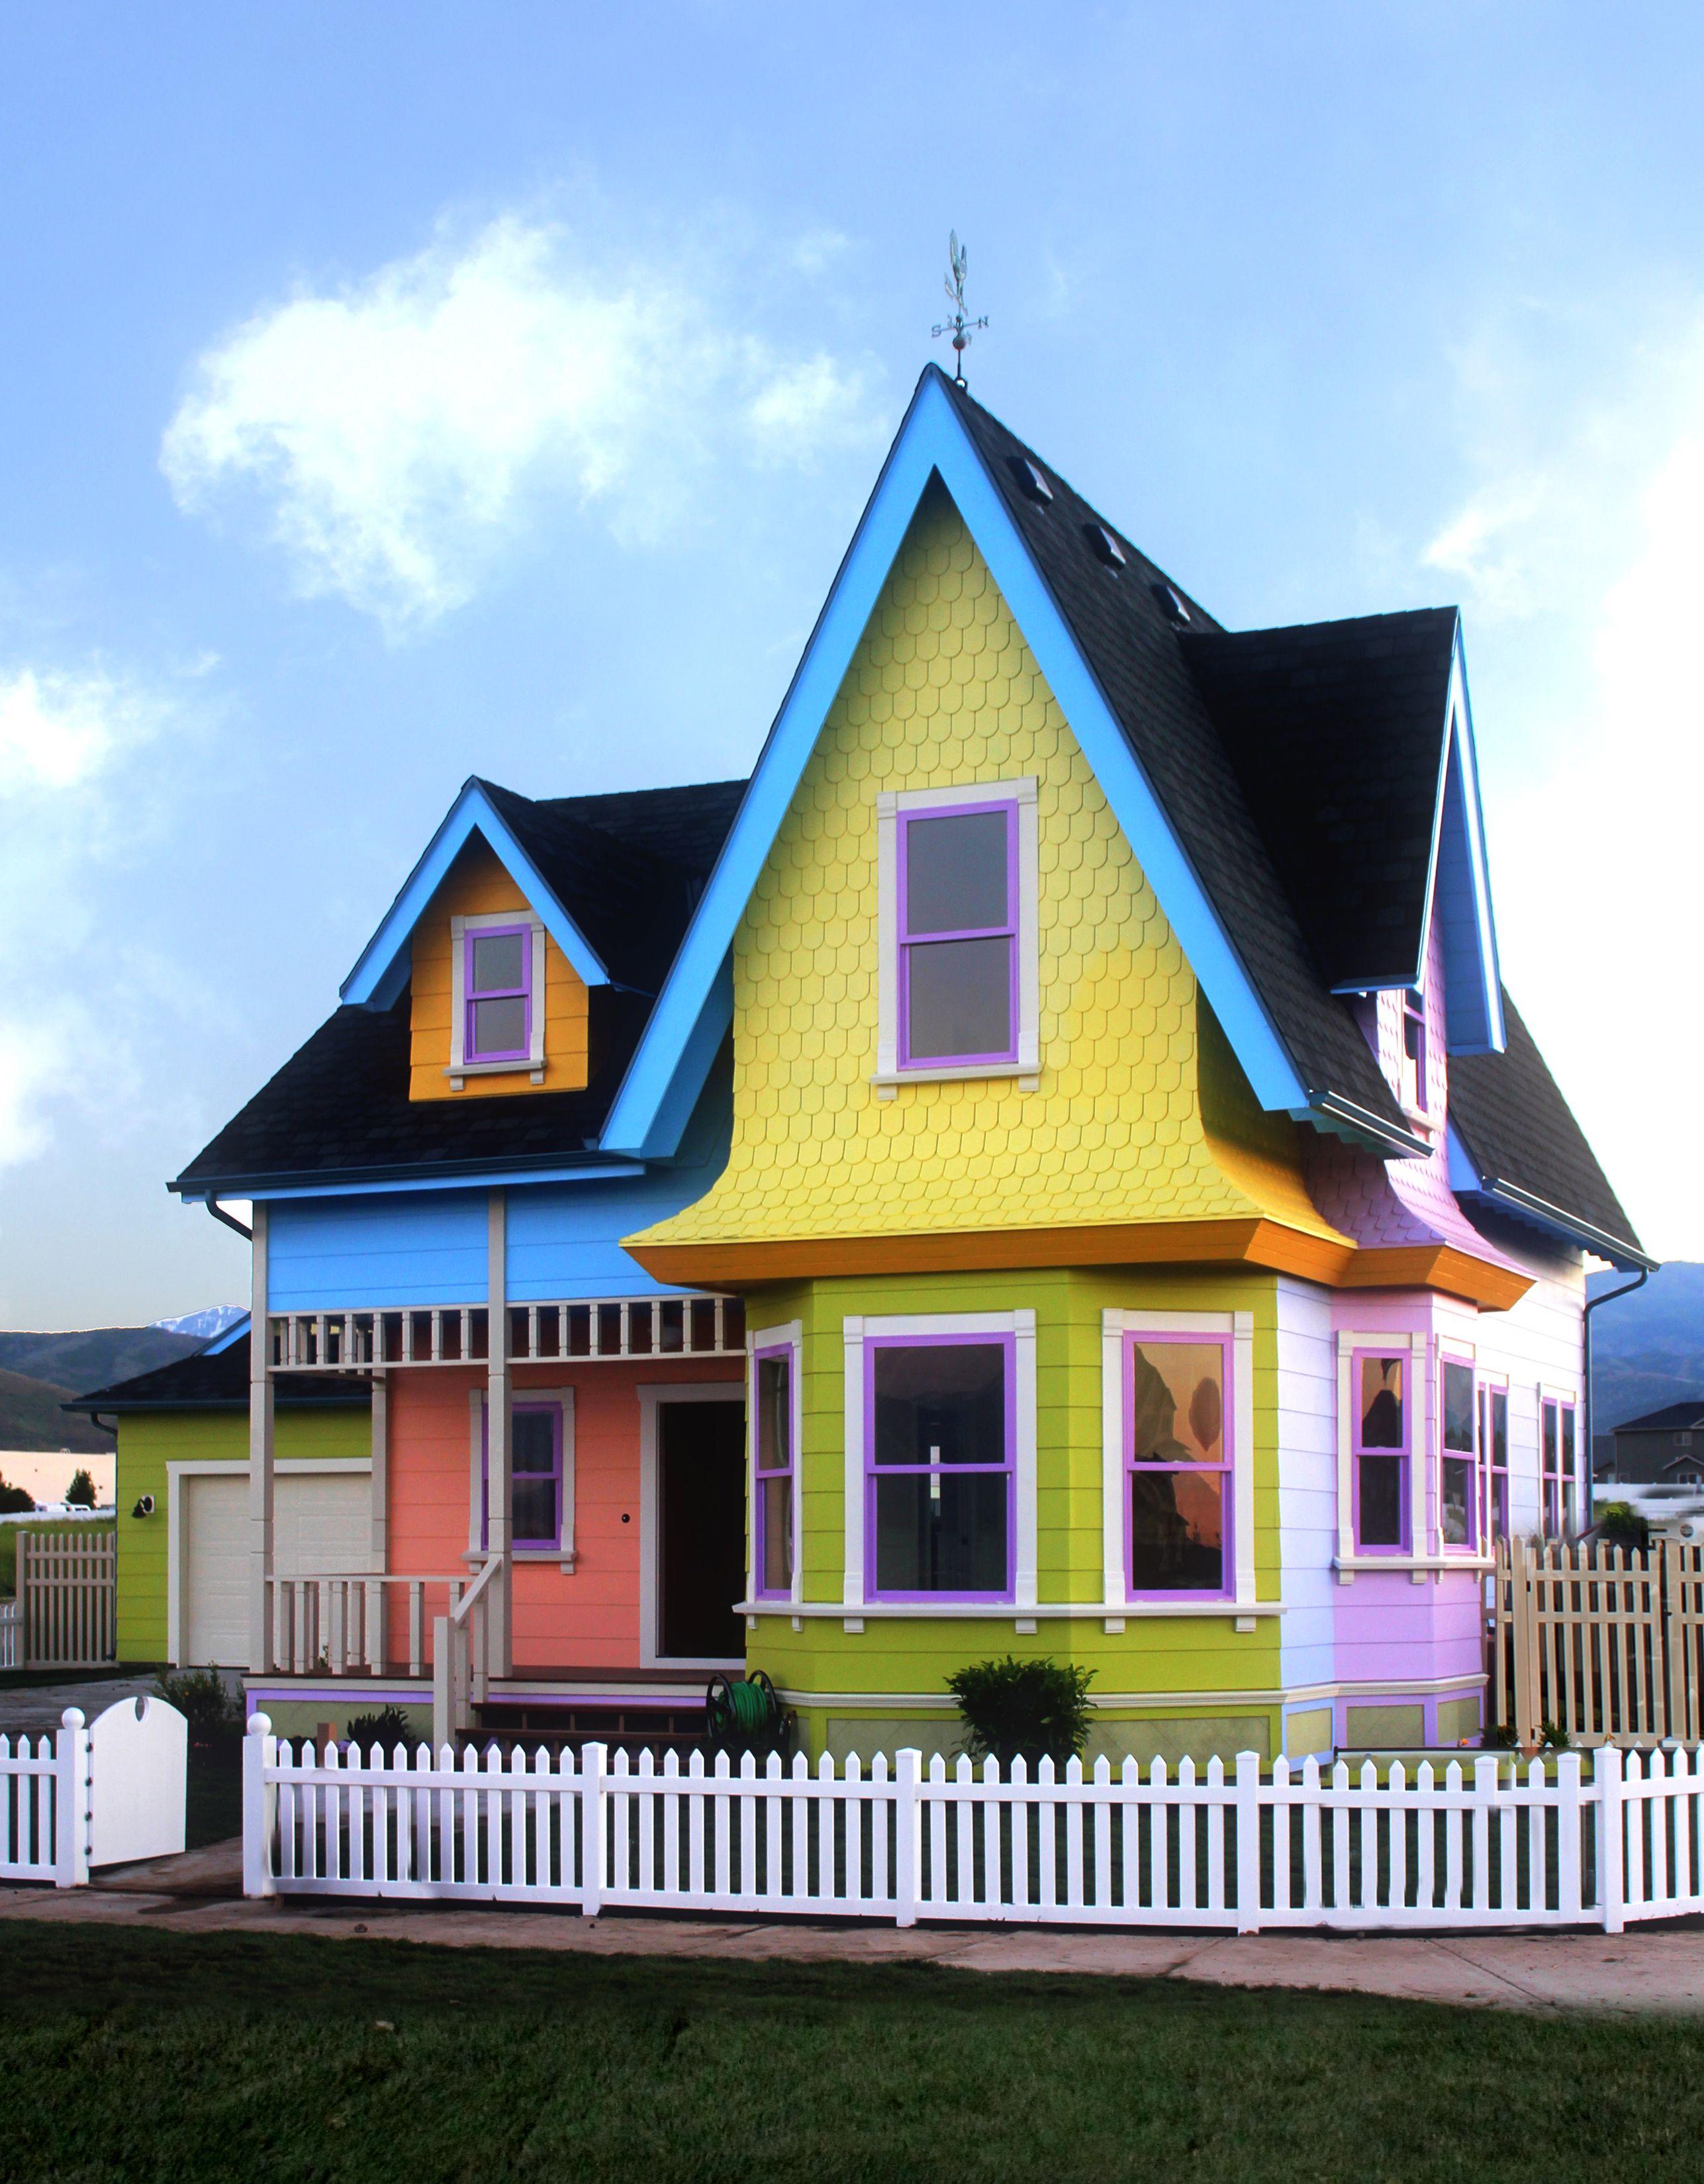 Disney Pixar Up House Has Responsible Windows Andersen